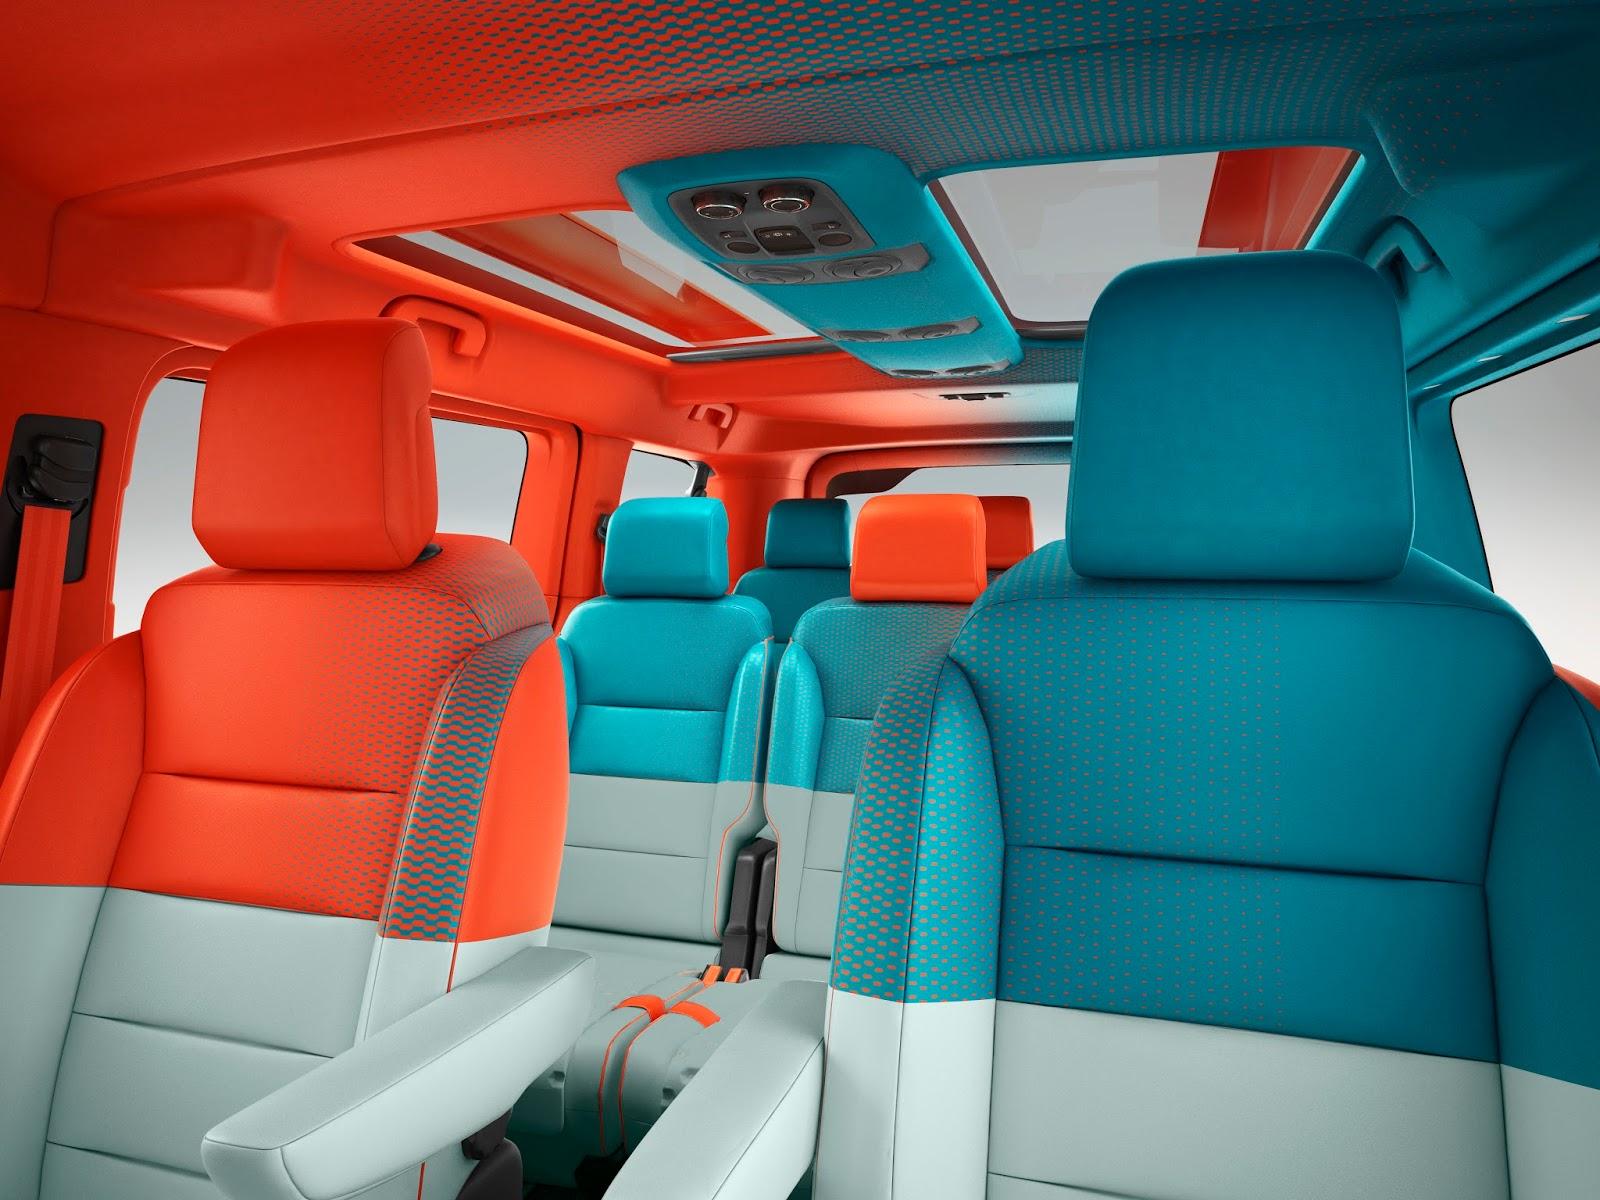 CL%2B16.020.007 Με 5 Παγκόσμιες Πρεμιέρες η Citroën Στο Σαλόνι Αυτοκινήτου της Γενεύης